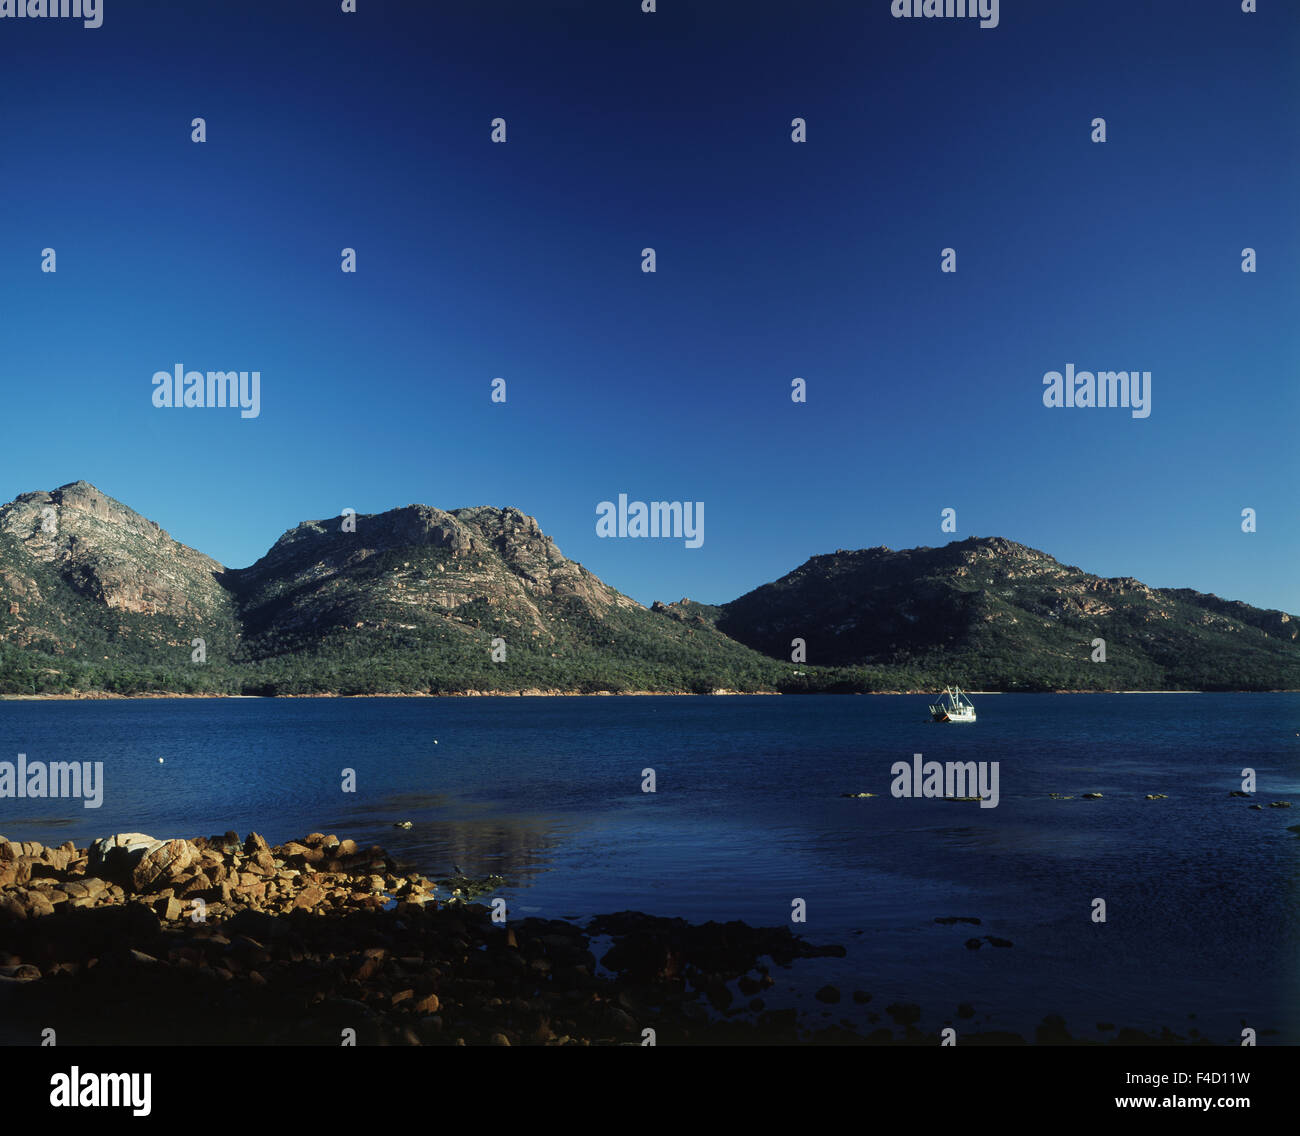 Australia, Tasmania. Peaks of Hazards and Coles Bay. (Large format sizes available) - Stock Image